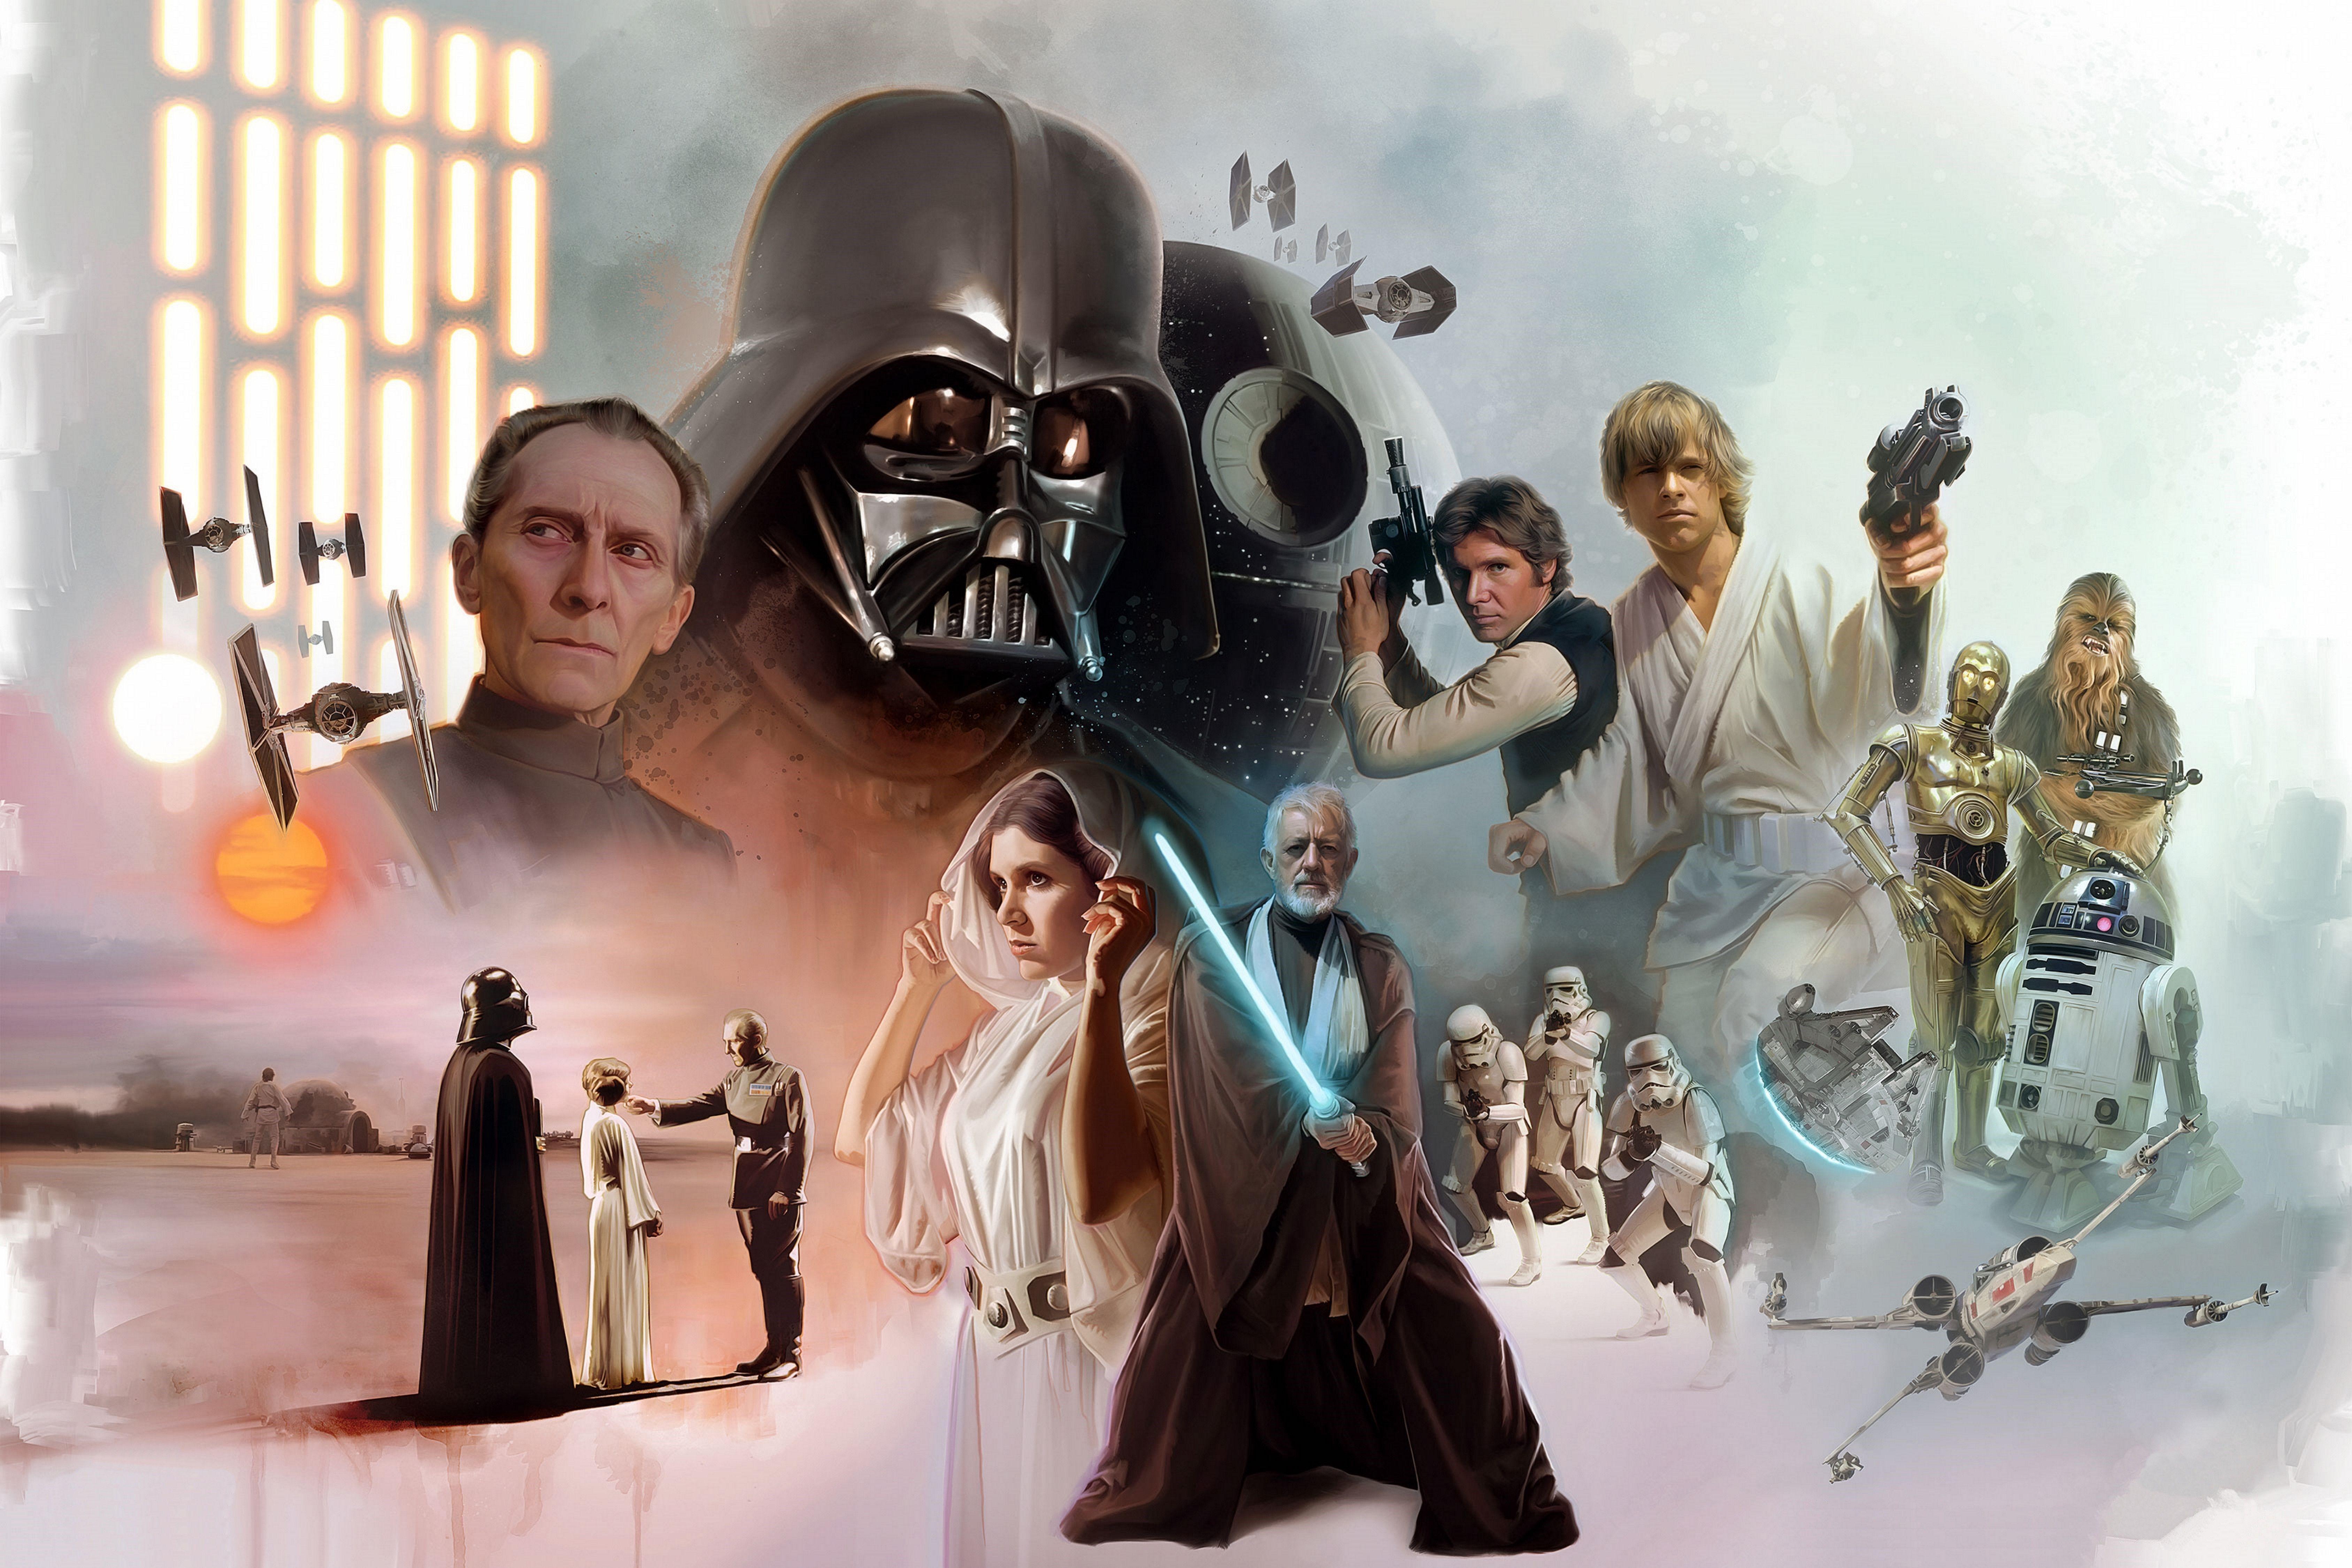 Star Wars Original Trilogy Wallpapers Top Free Star Wars Original Trilogy Backgrounds Wallpaperaccess